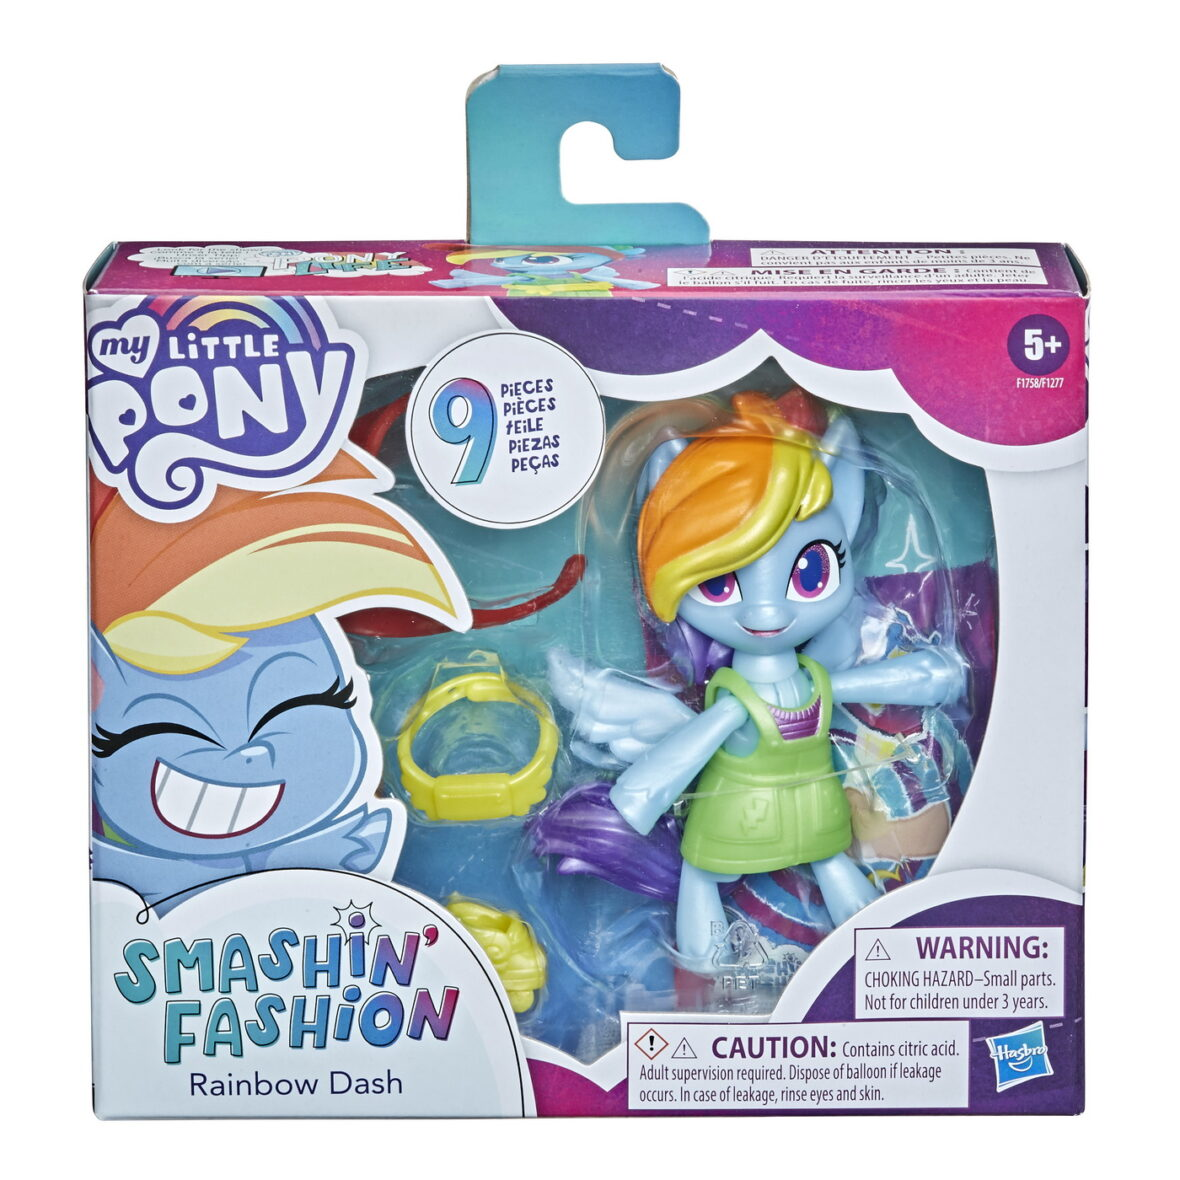 My Little Pony Smashin Fashion Rainbow Dash